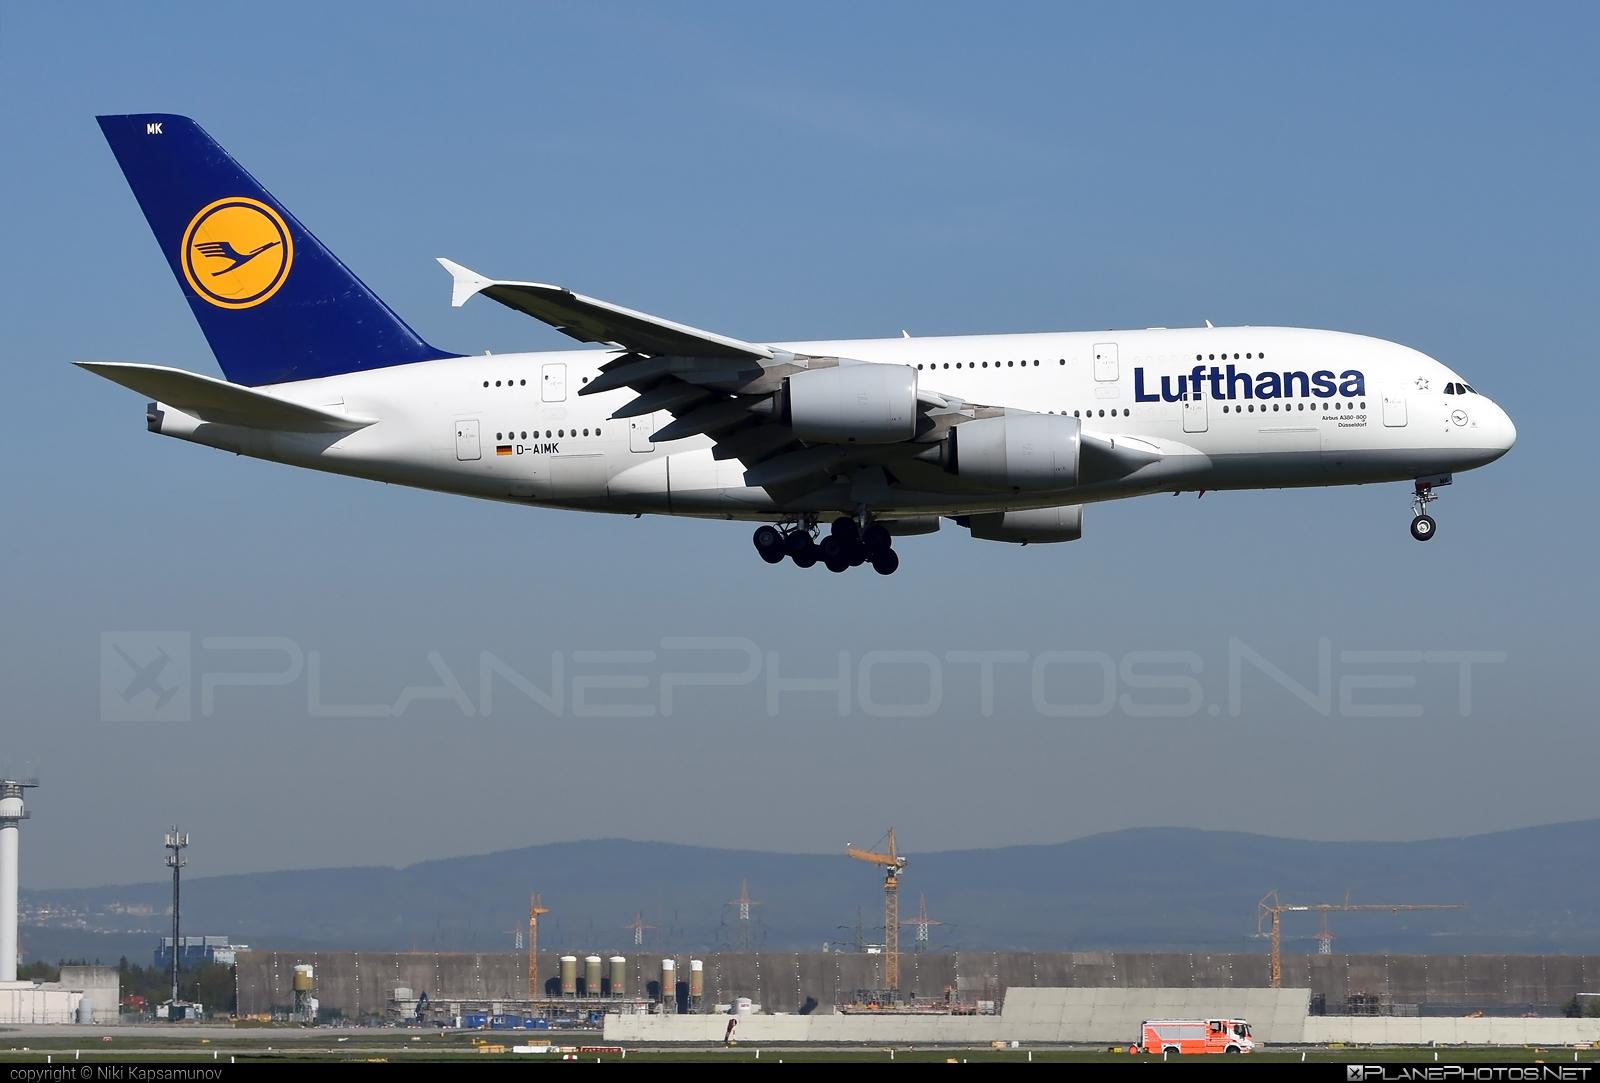 Airbus A380-841 - D-AIMK operated by Lufthansa #a380 #a380family #airbus #airbus380 #lufthansa